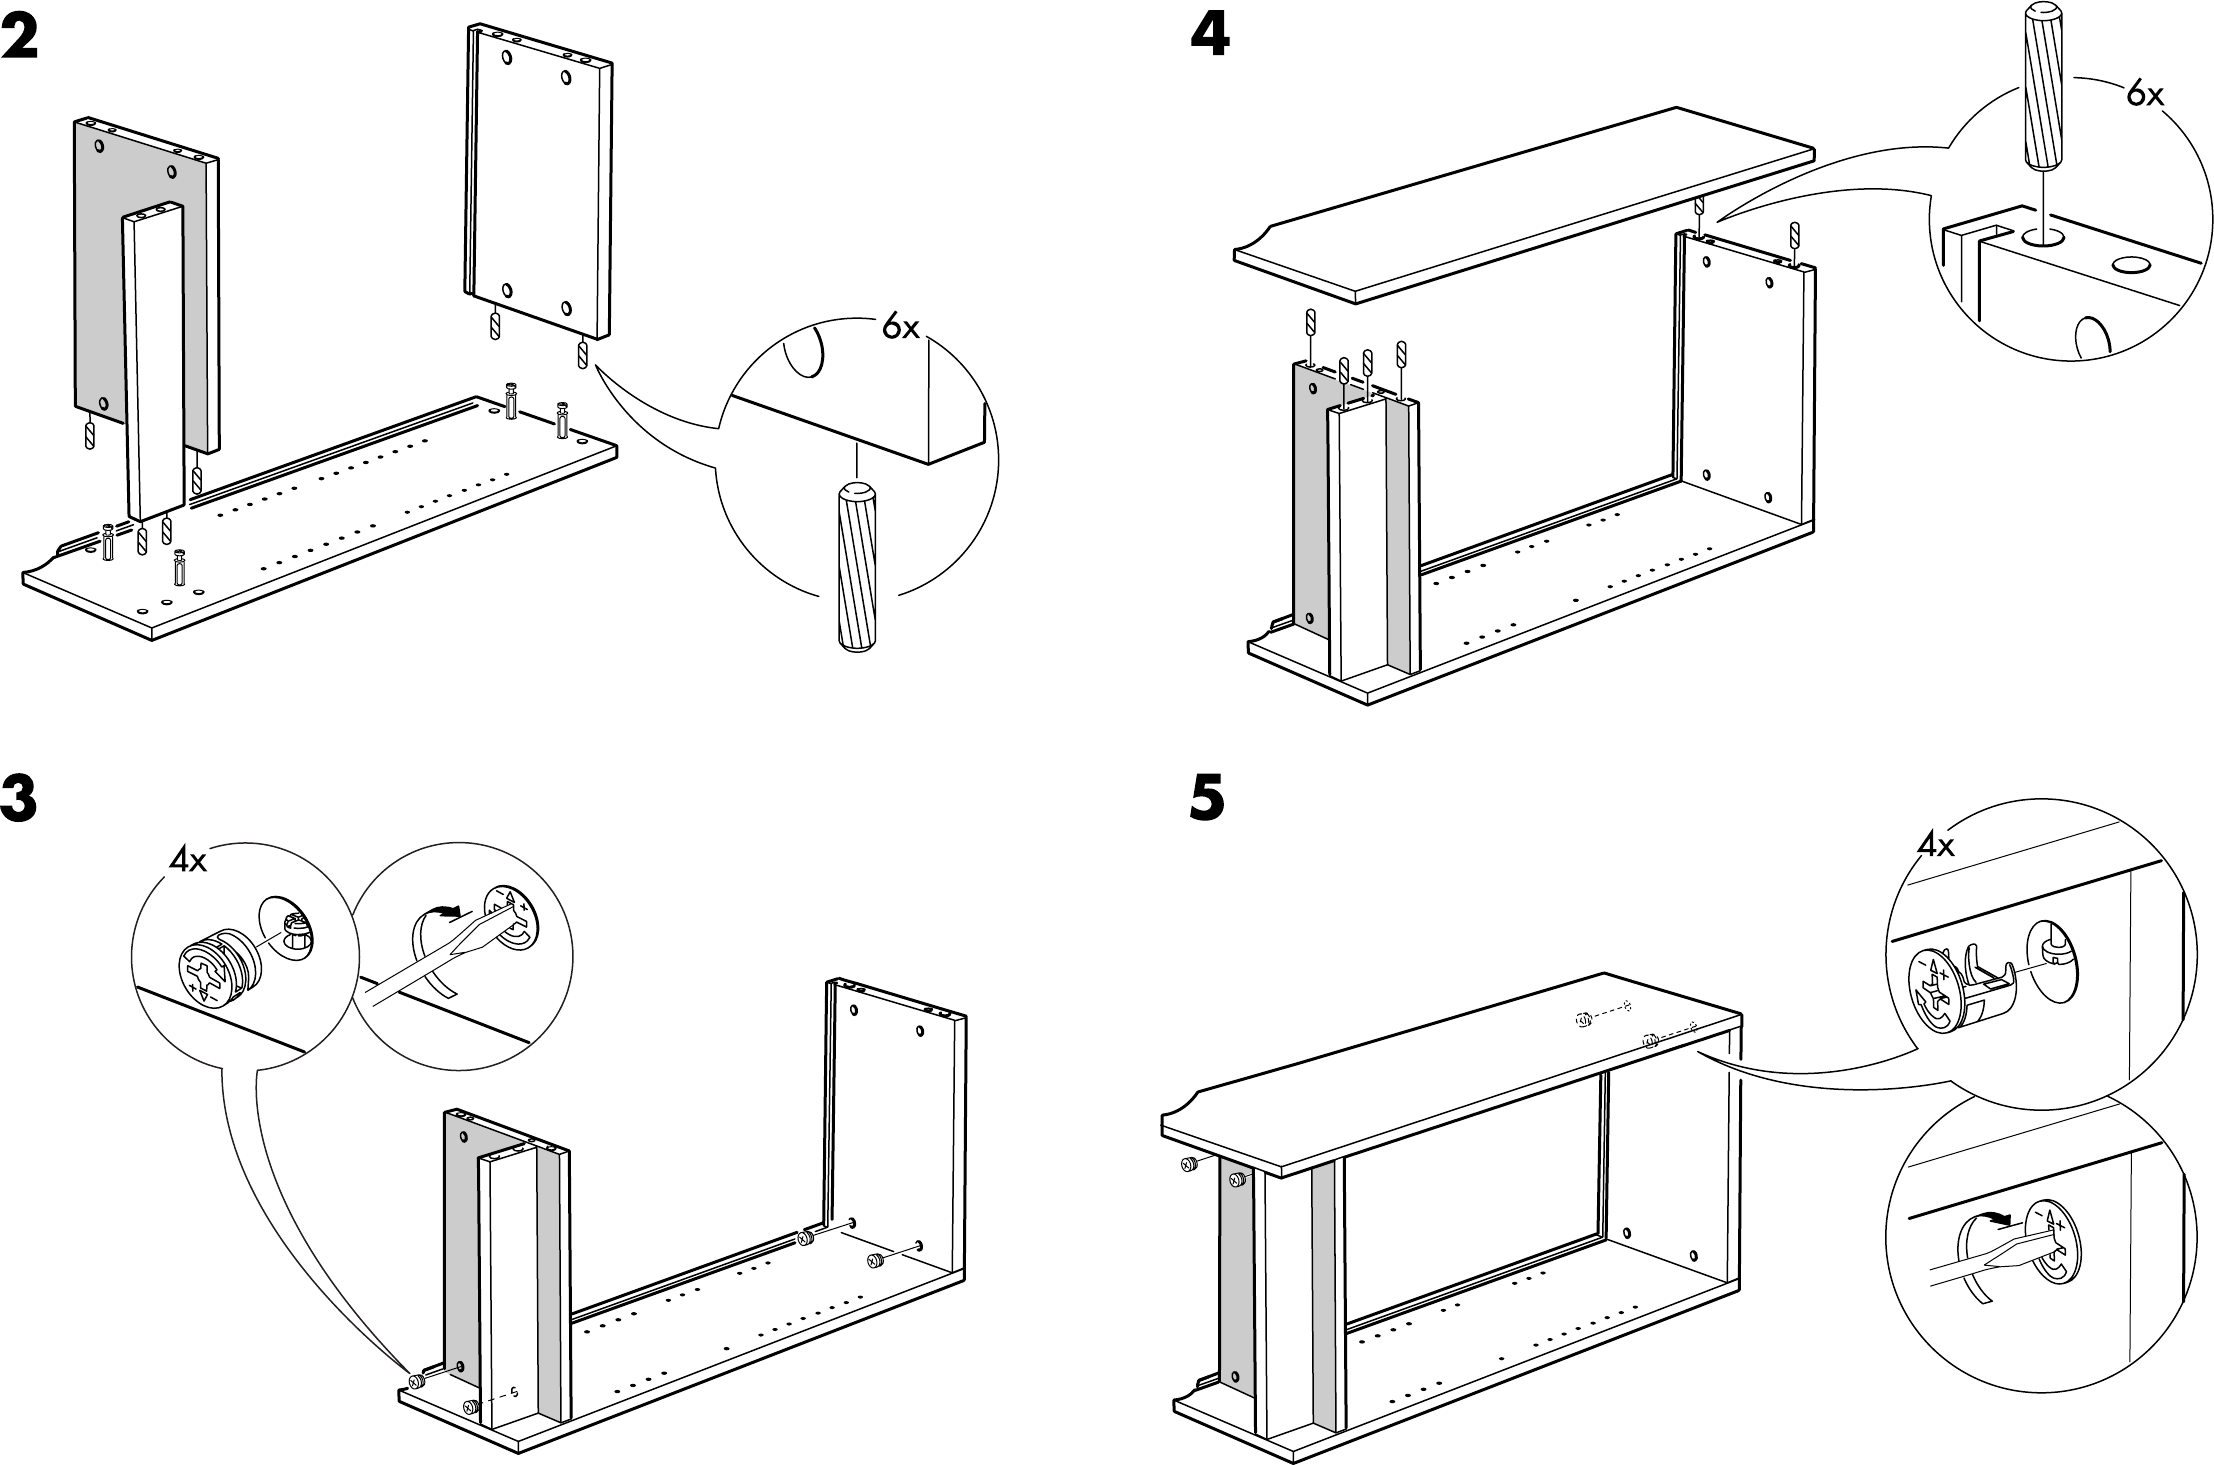 handleiding ikea billy boekenkast pagina 4 van 4 dansk deutsch english espan l fran ais. Black Bedroom Furniture Sets. Home Design Ideas